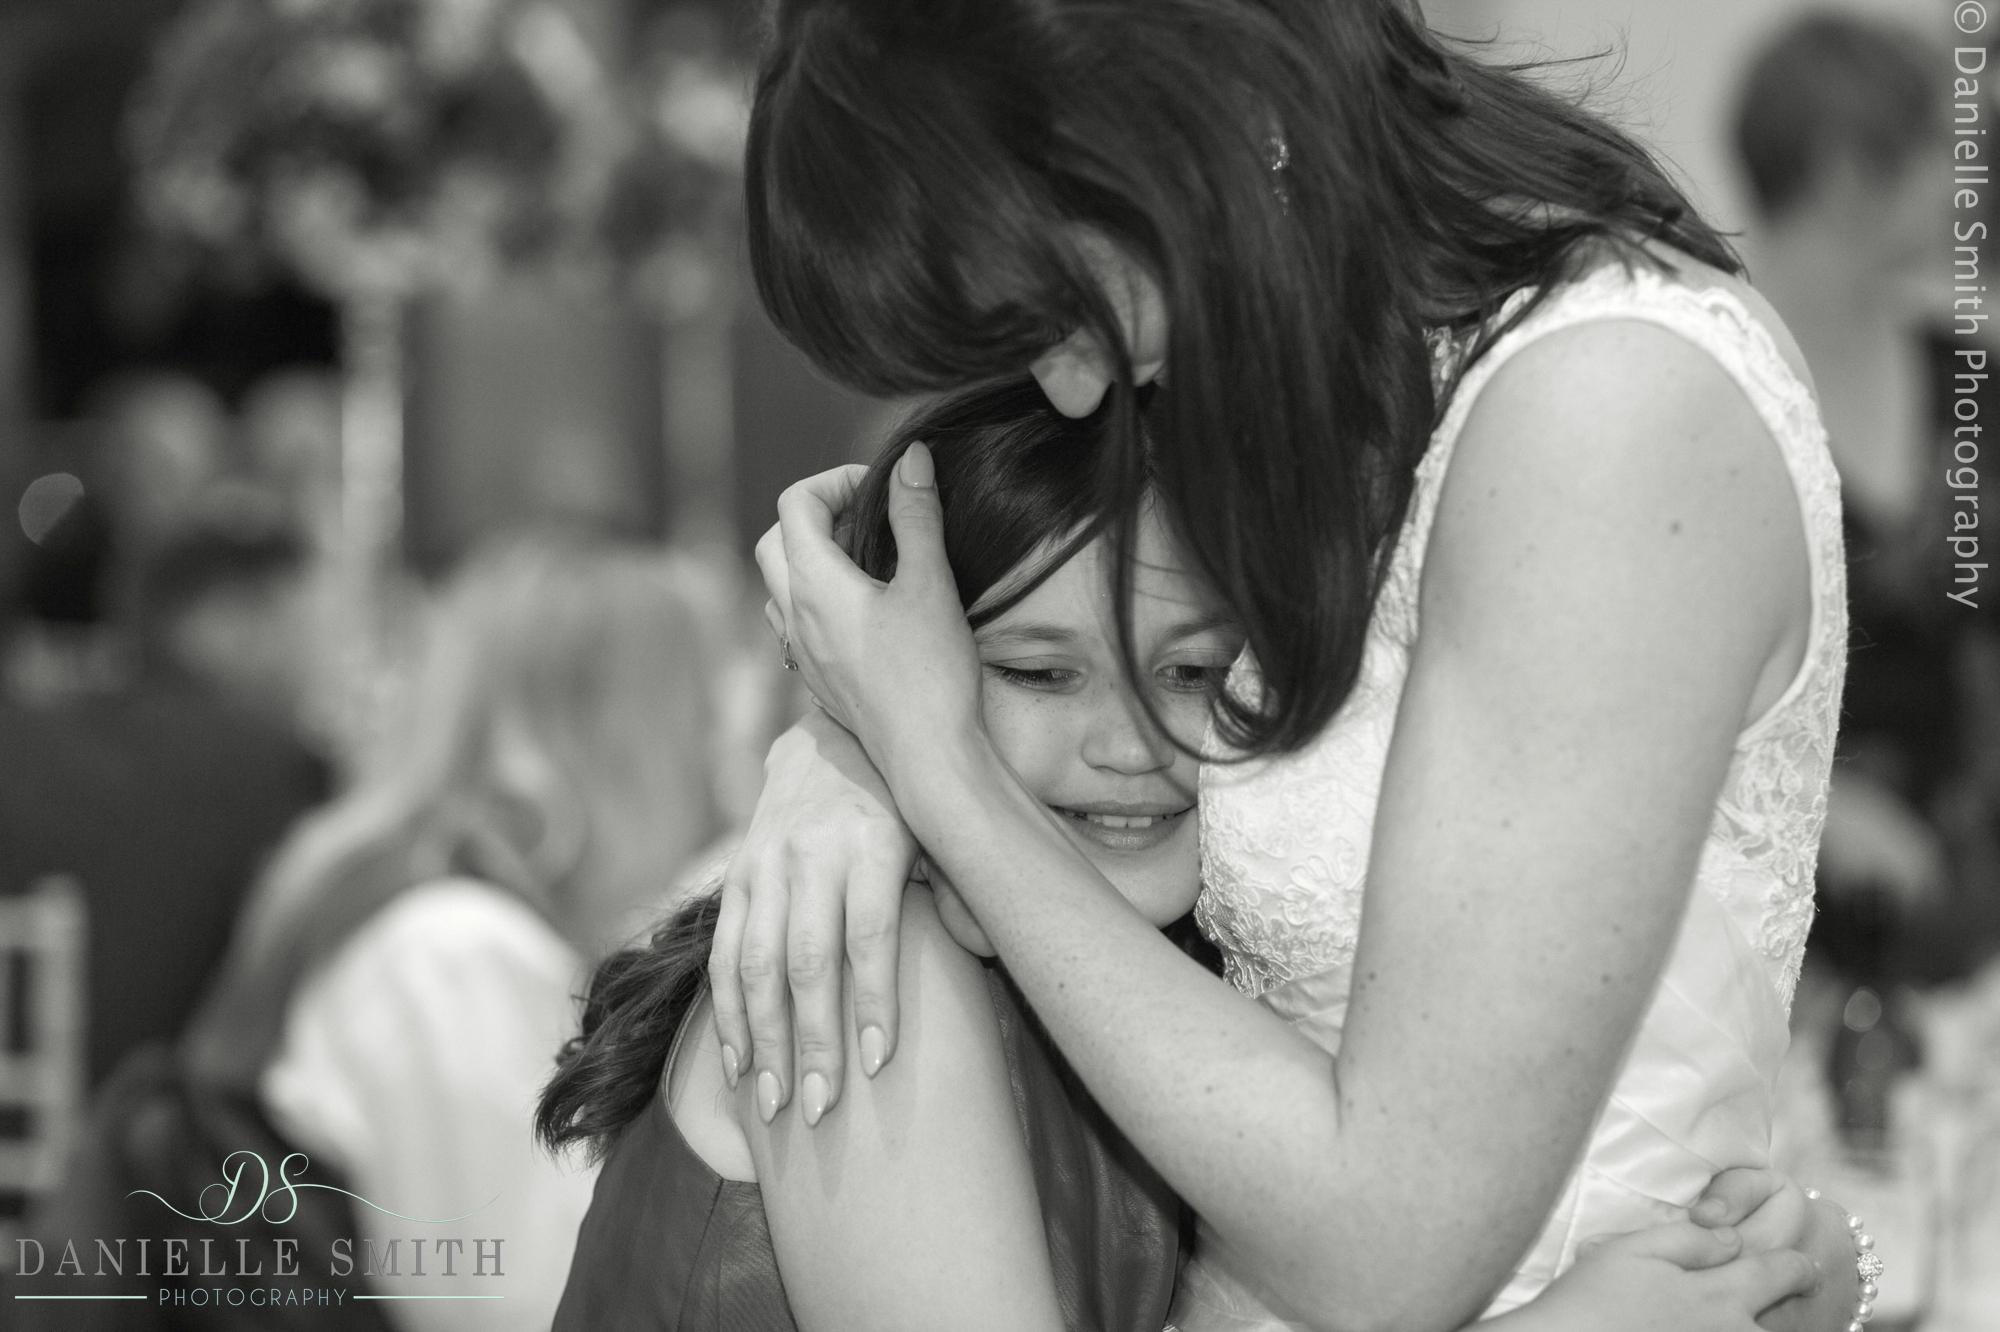 bride hugging flower girl - 1920s style wedding